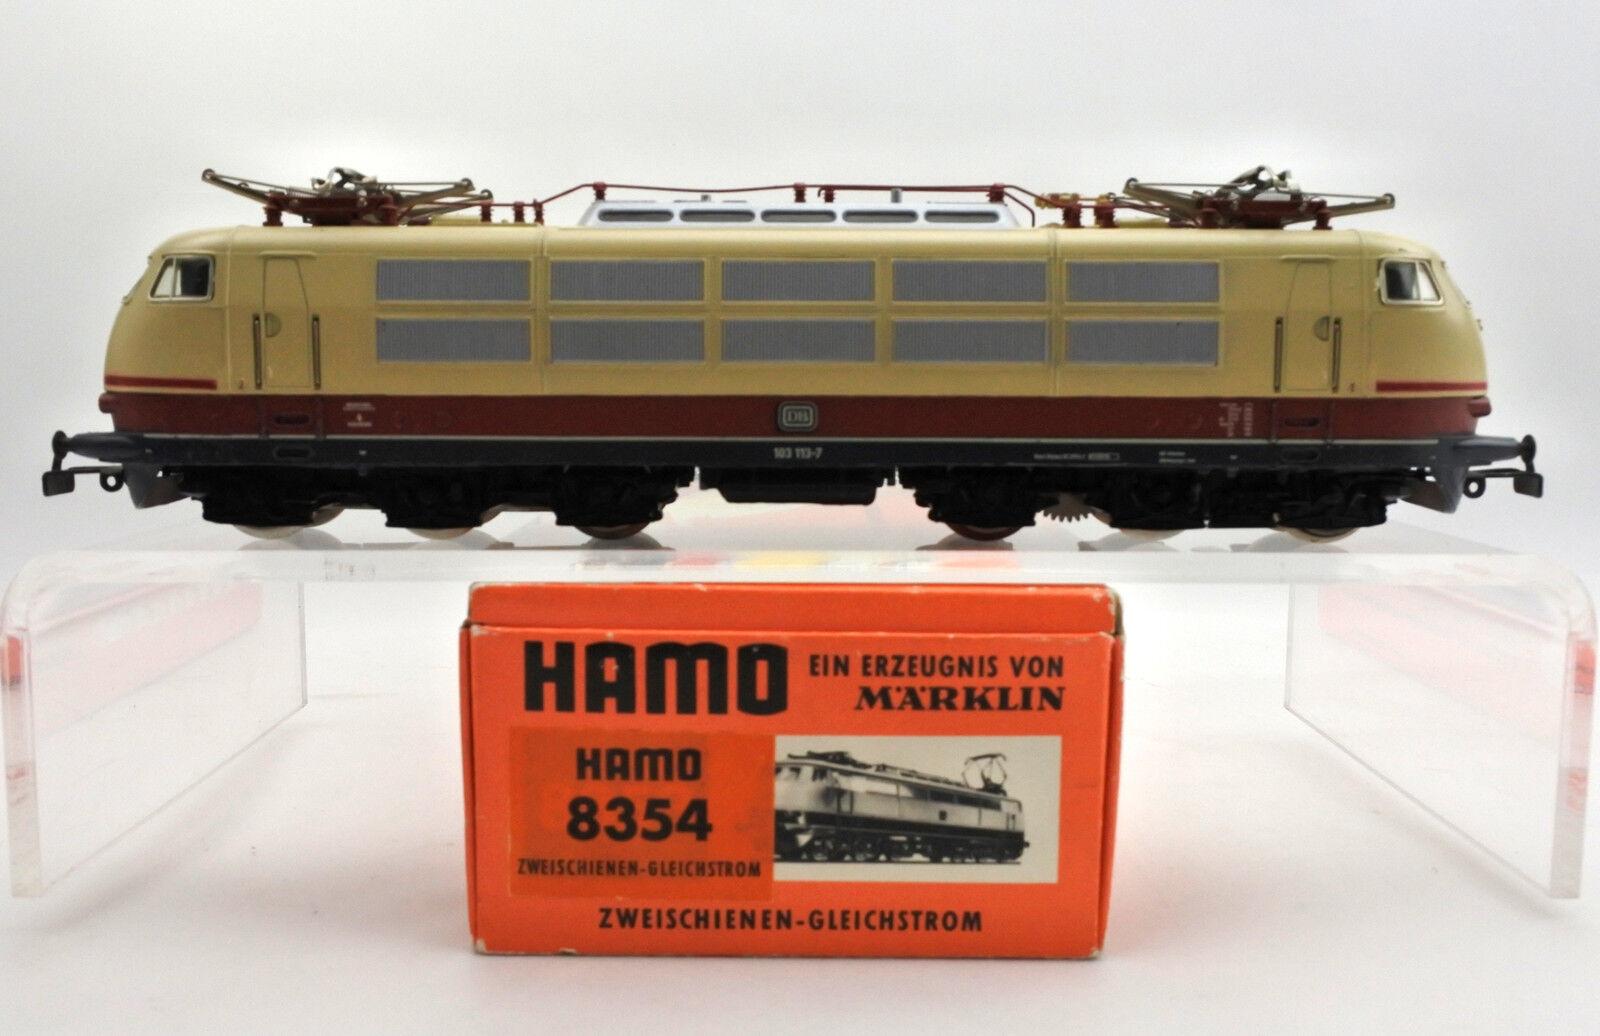 MARKLIN - HAMO HO SCALE 8354 DB TEE ELECTRIC ENGINE